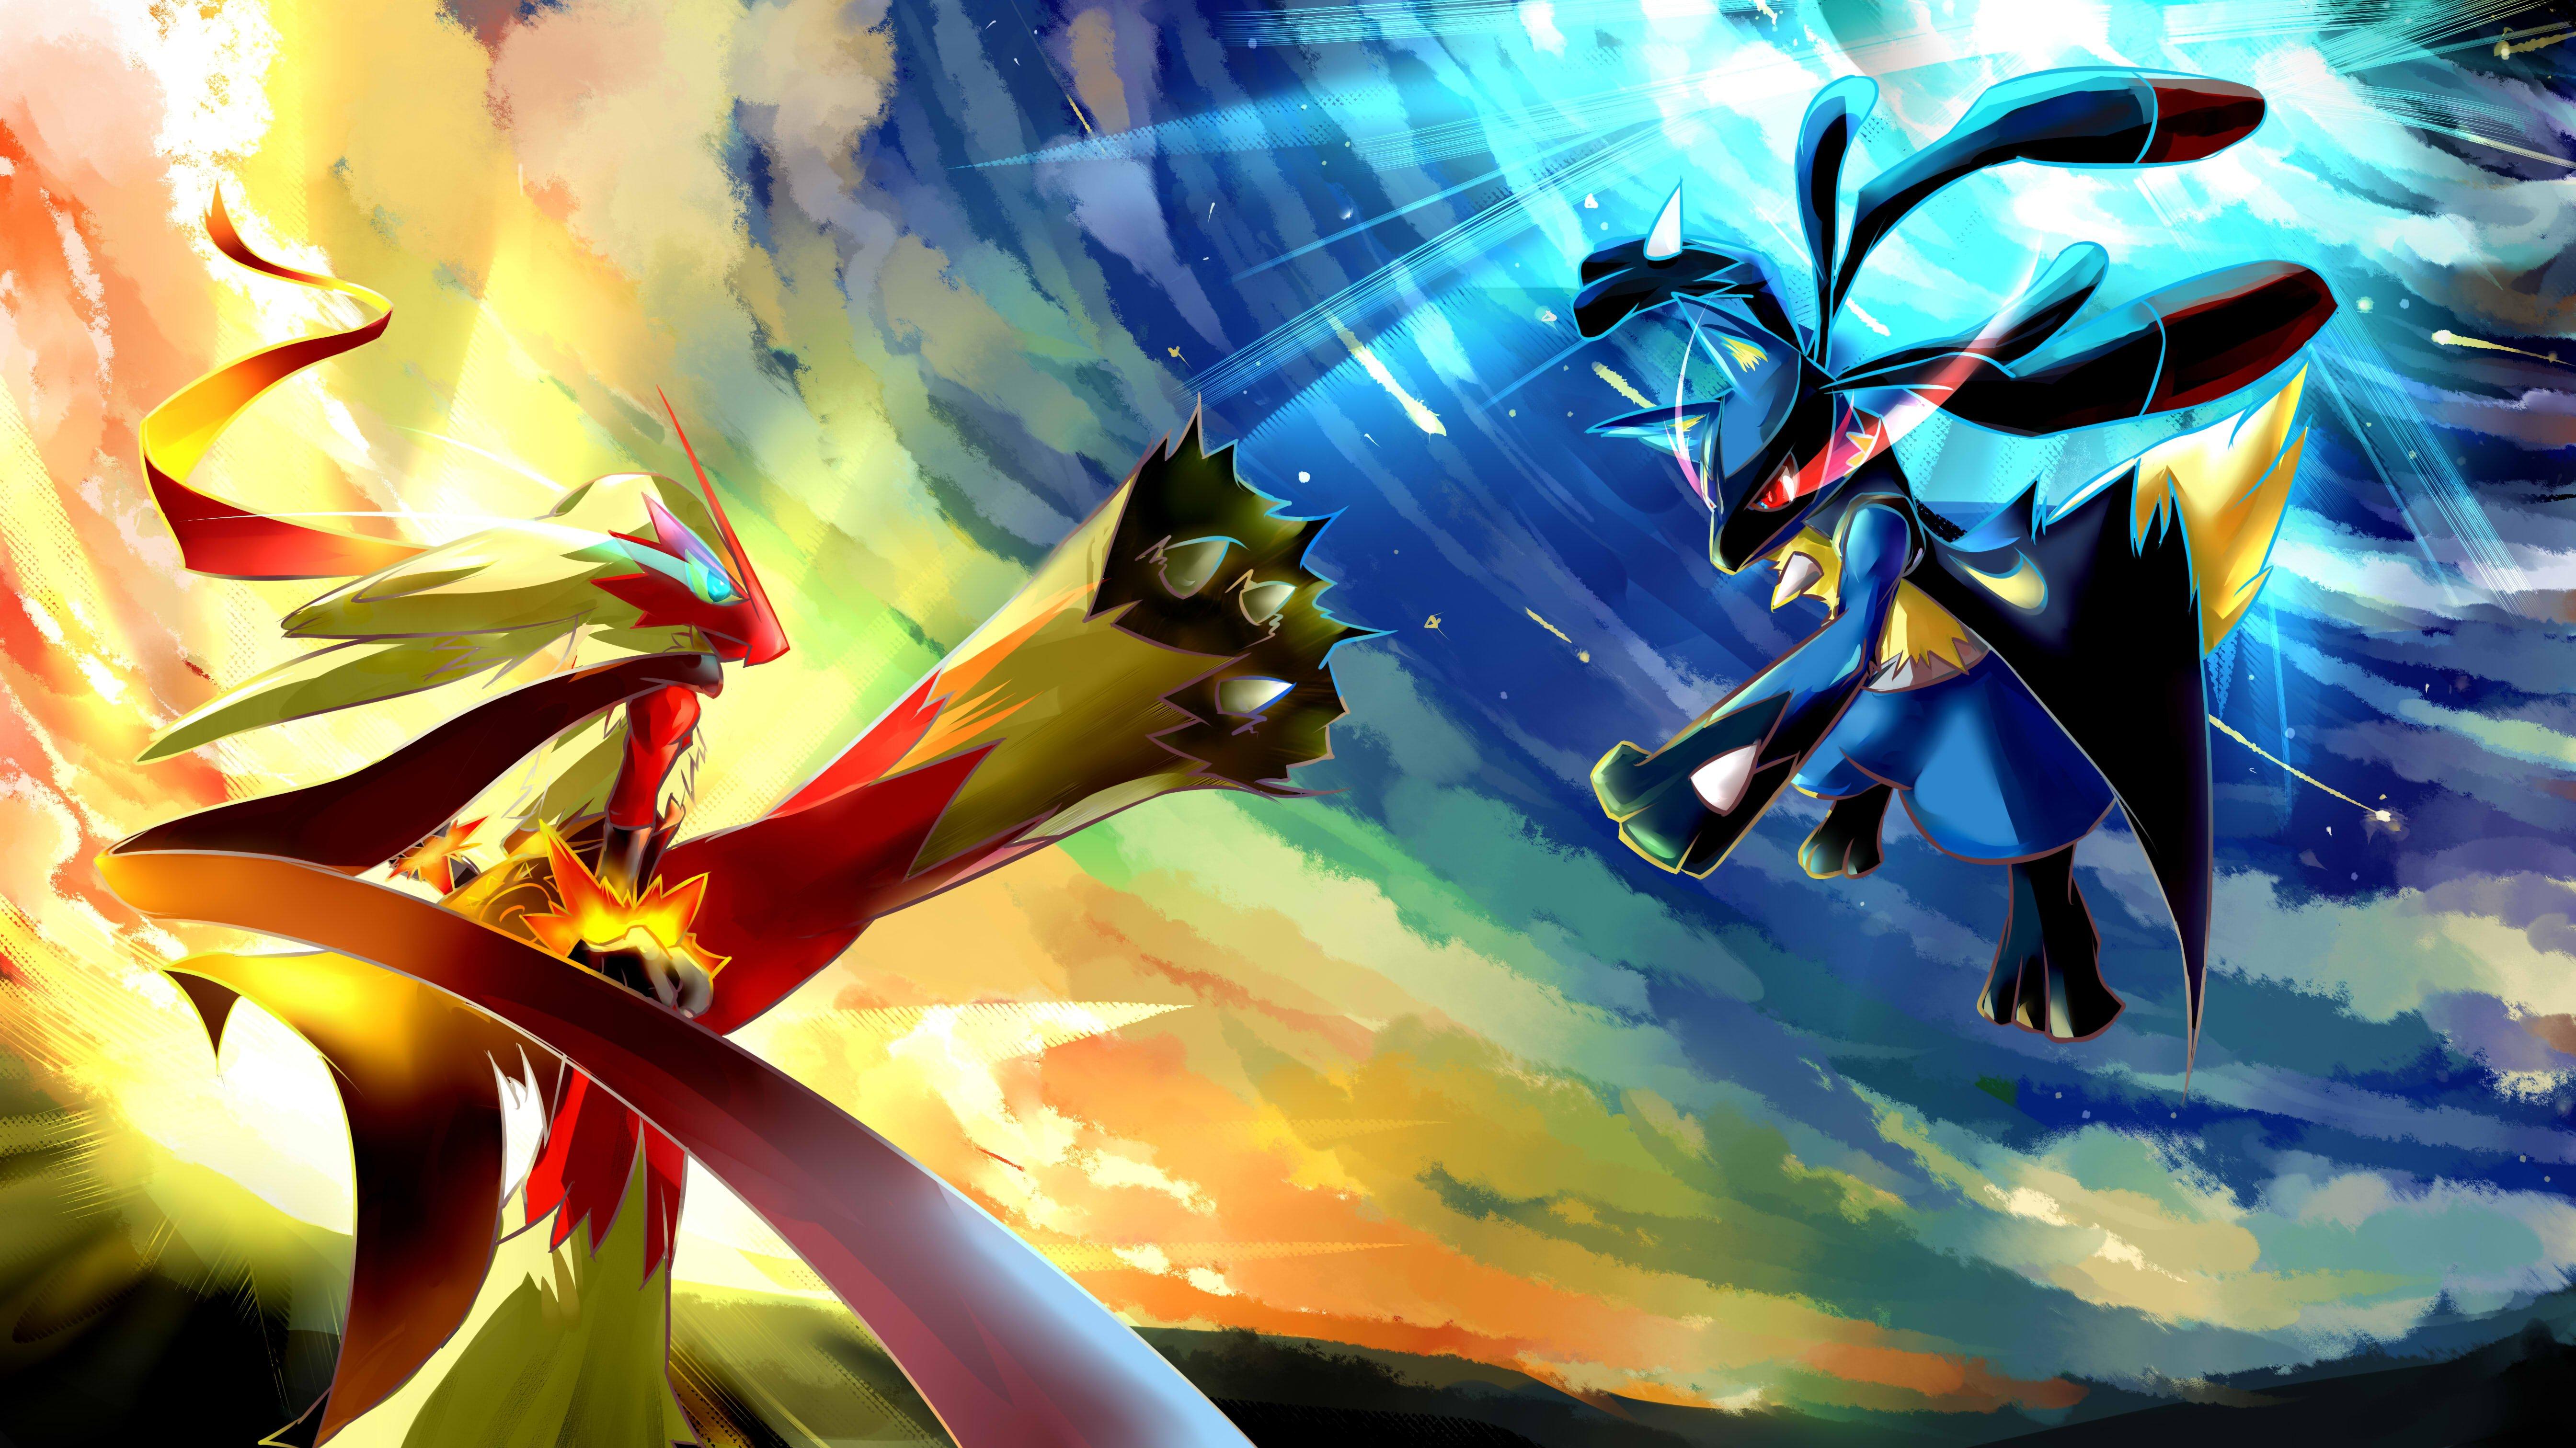 Fondos de pantalla Lucario vs Blaziken Pokémon